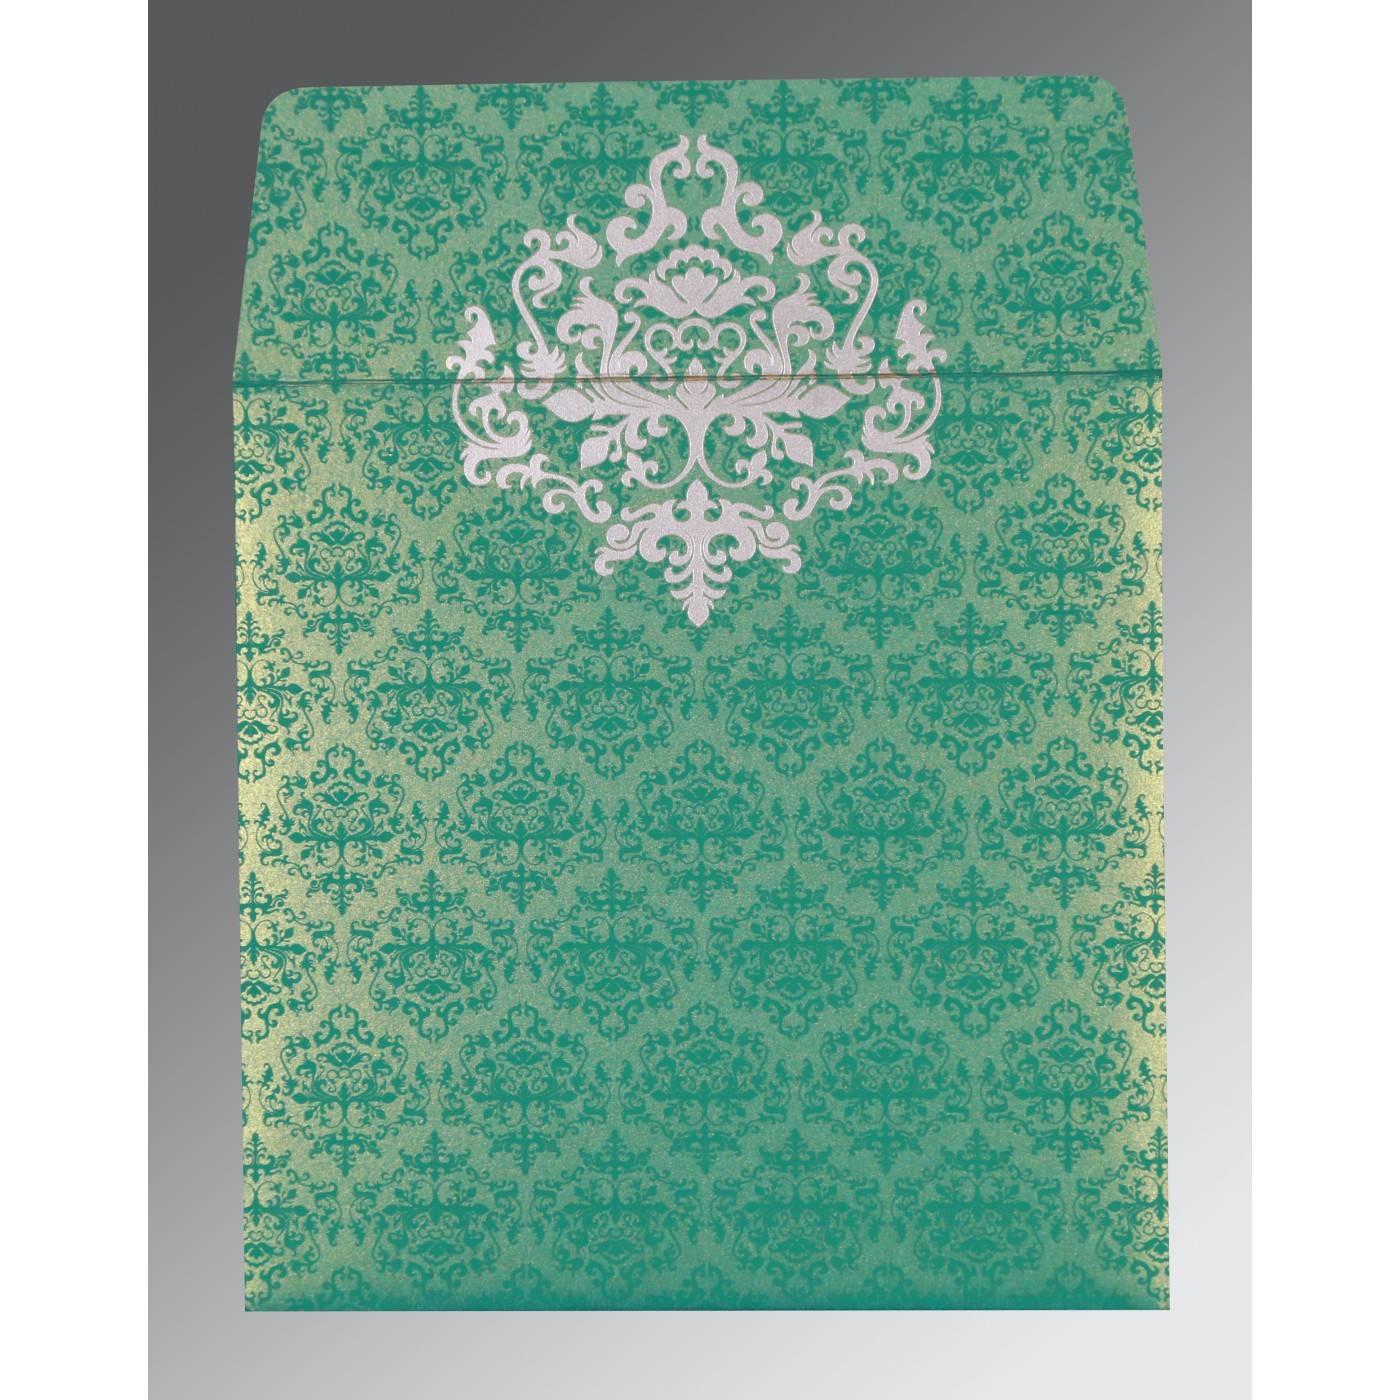 TURQUOISE SHIMMERY DAMASK THEMED - SCREEN PRINTED WEDDING CARD : CI-8254E - IndianWeddingCards